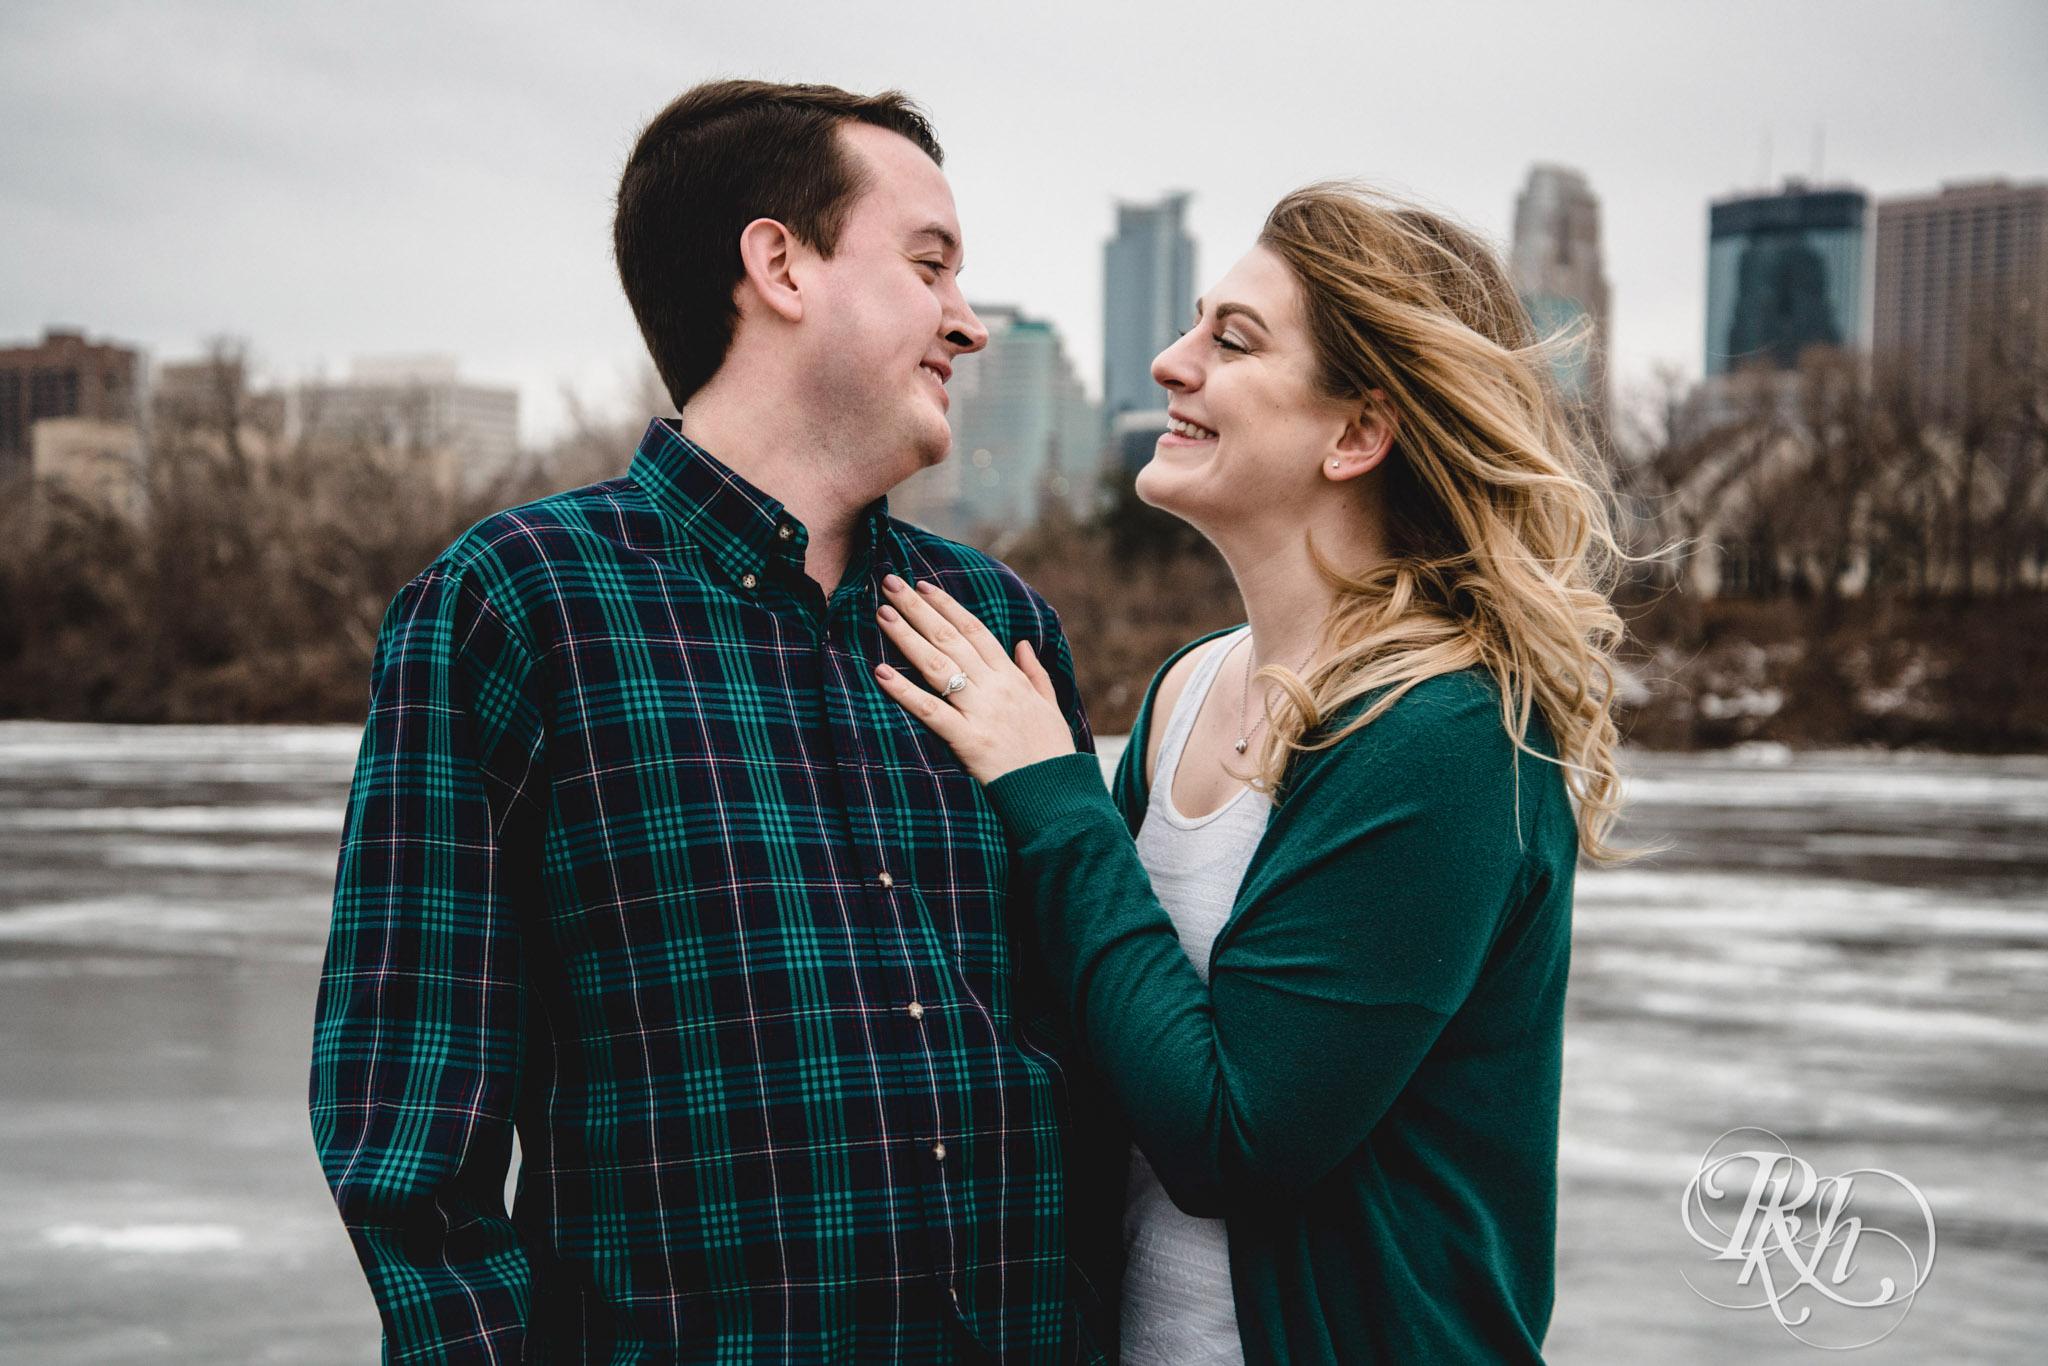 Libby & Ian - Minneapolis Engagement Photography - Honey Lounge - RKH Images (1 of 26).jpg